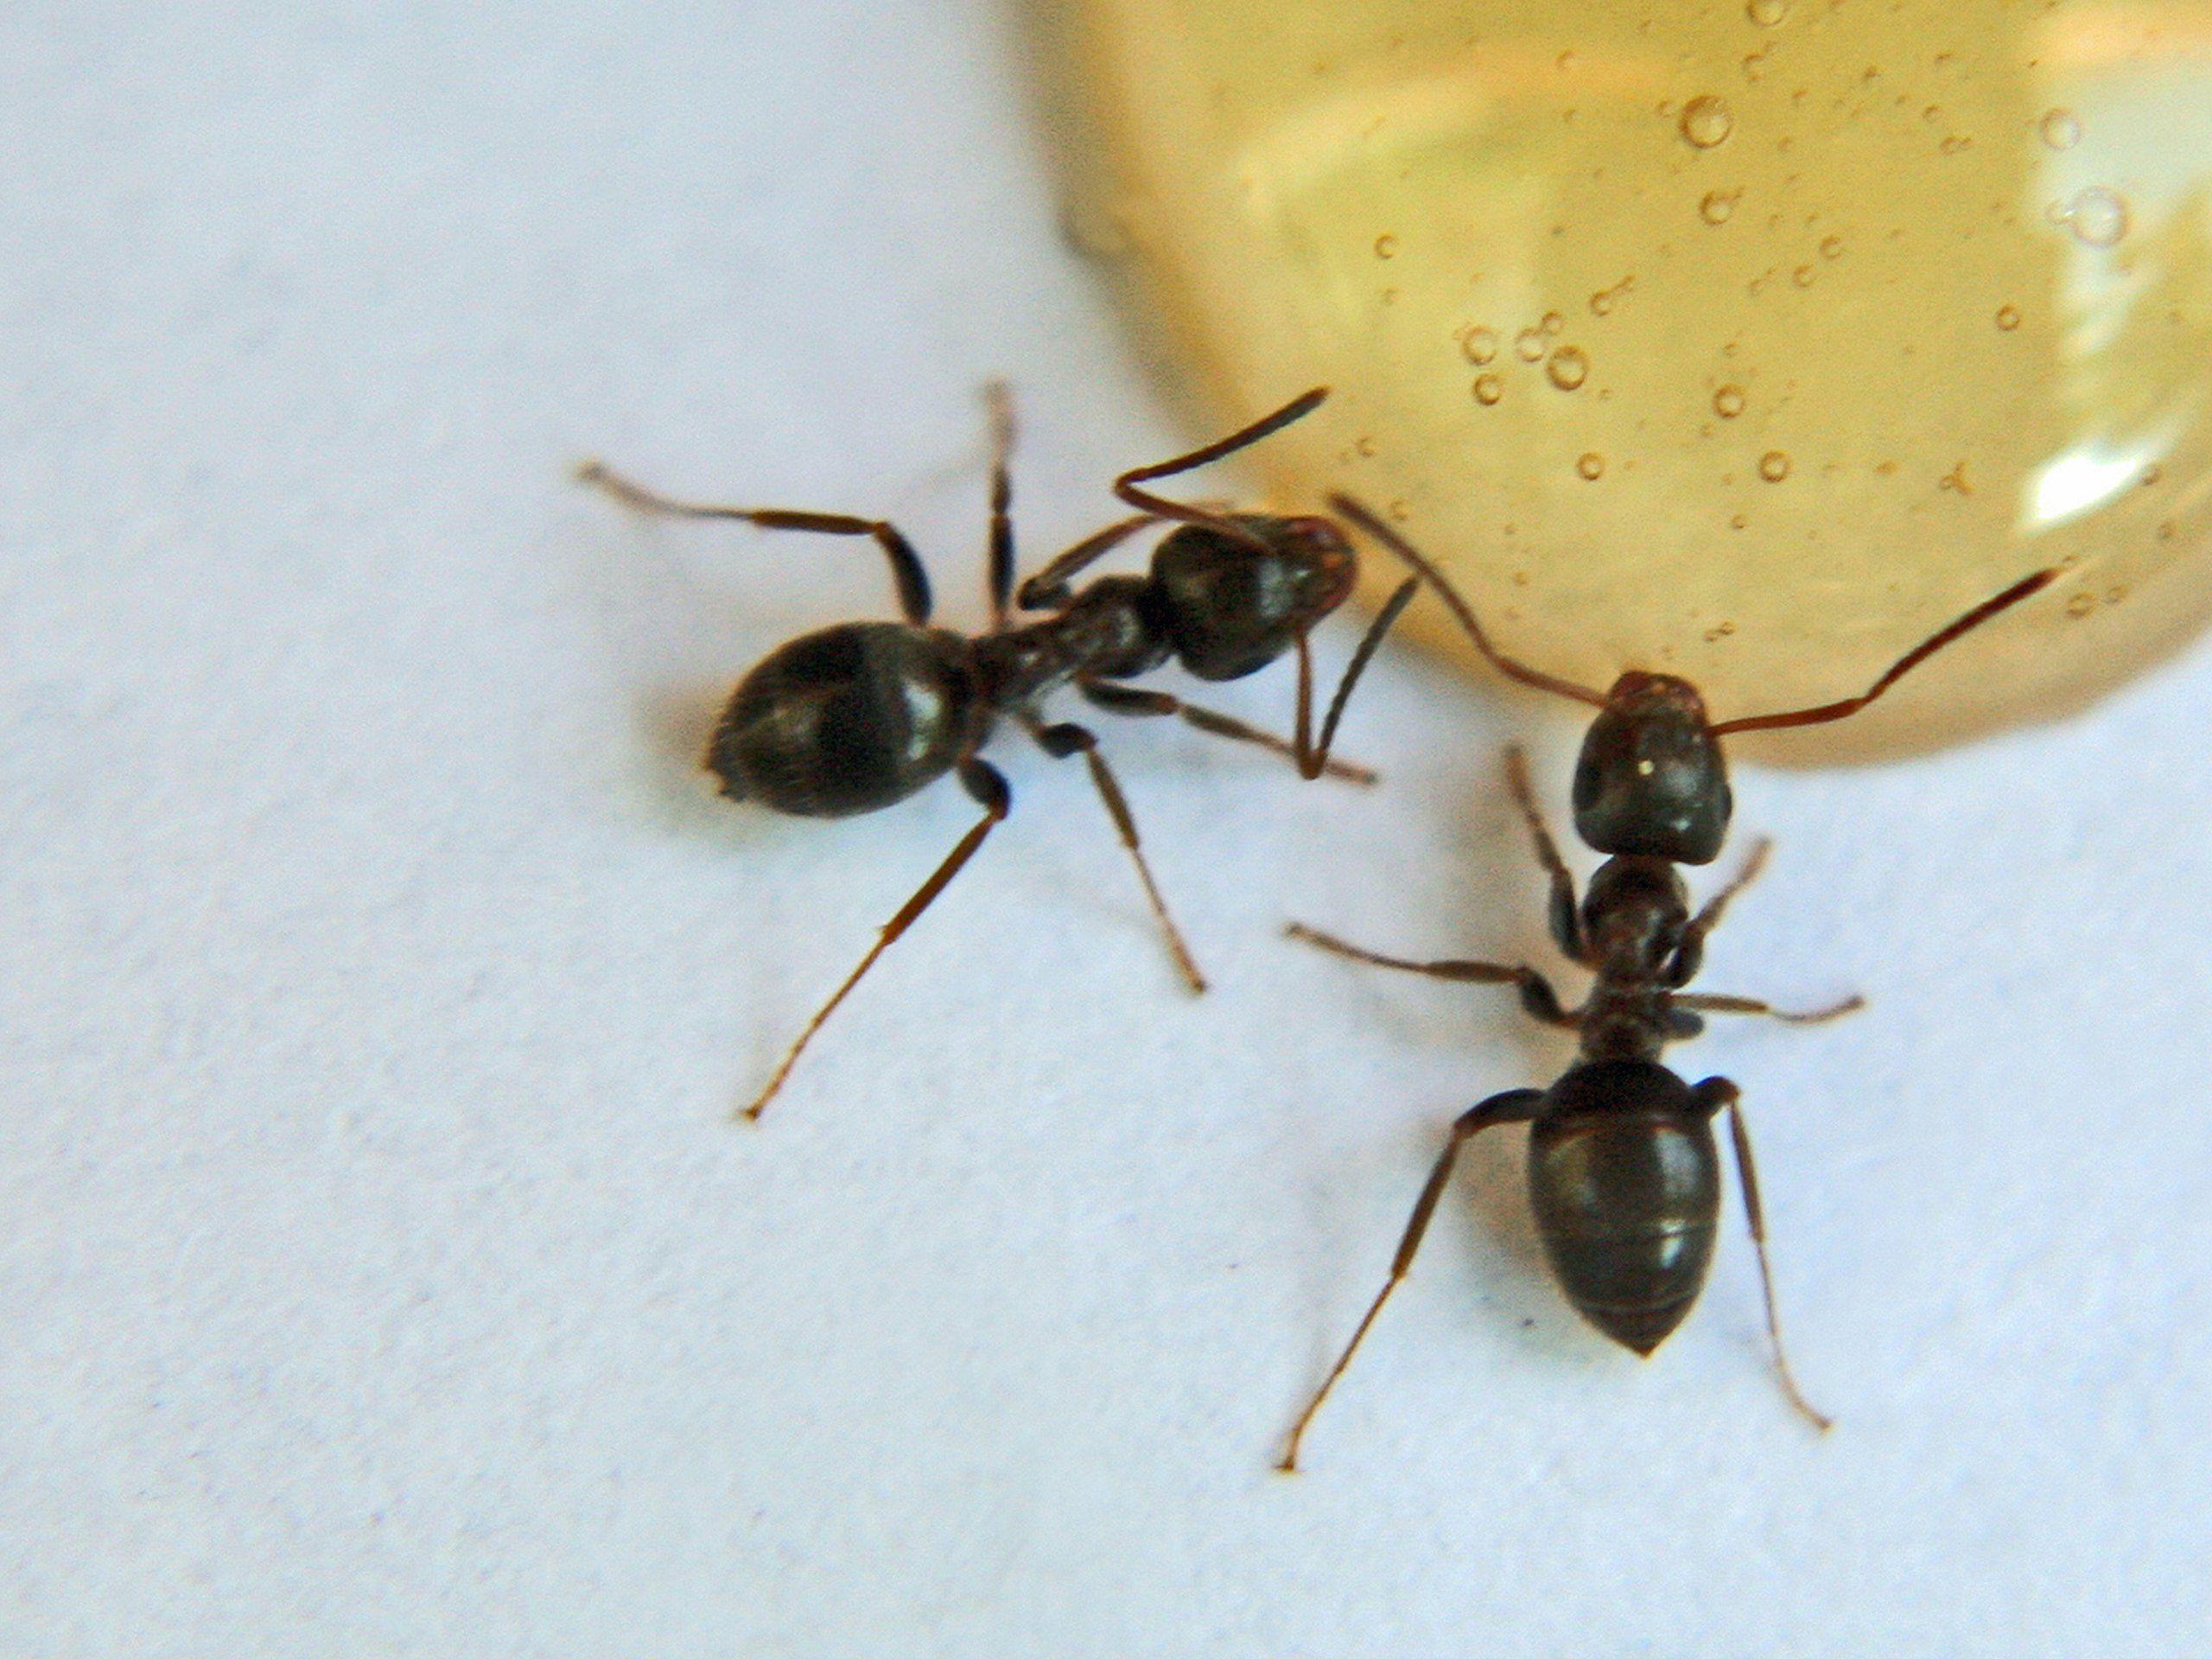 Best Ways To Get Rid Of Sugar Ants Sugar Ants Termite Control Rid Of Ants